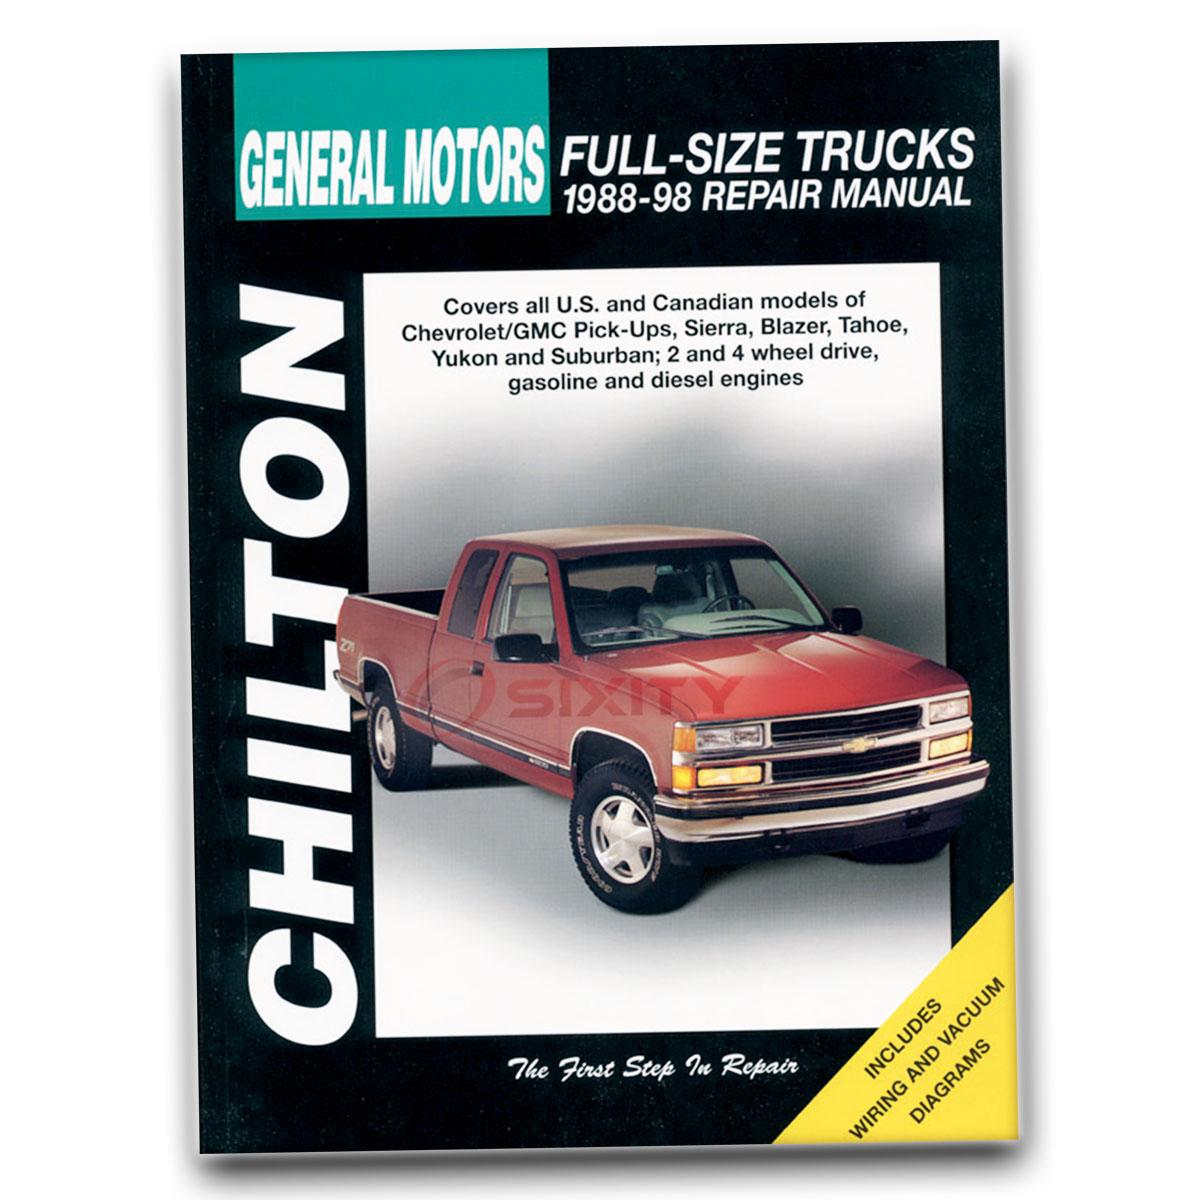 chevy blazer chilton repair manual silverado base scottsdale rh ebay com 1980 Chevy Blazer 1989 Chevy Blazer